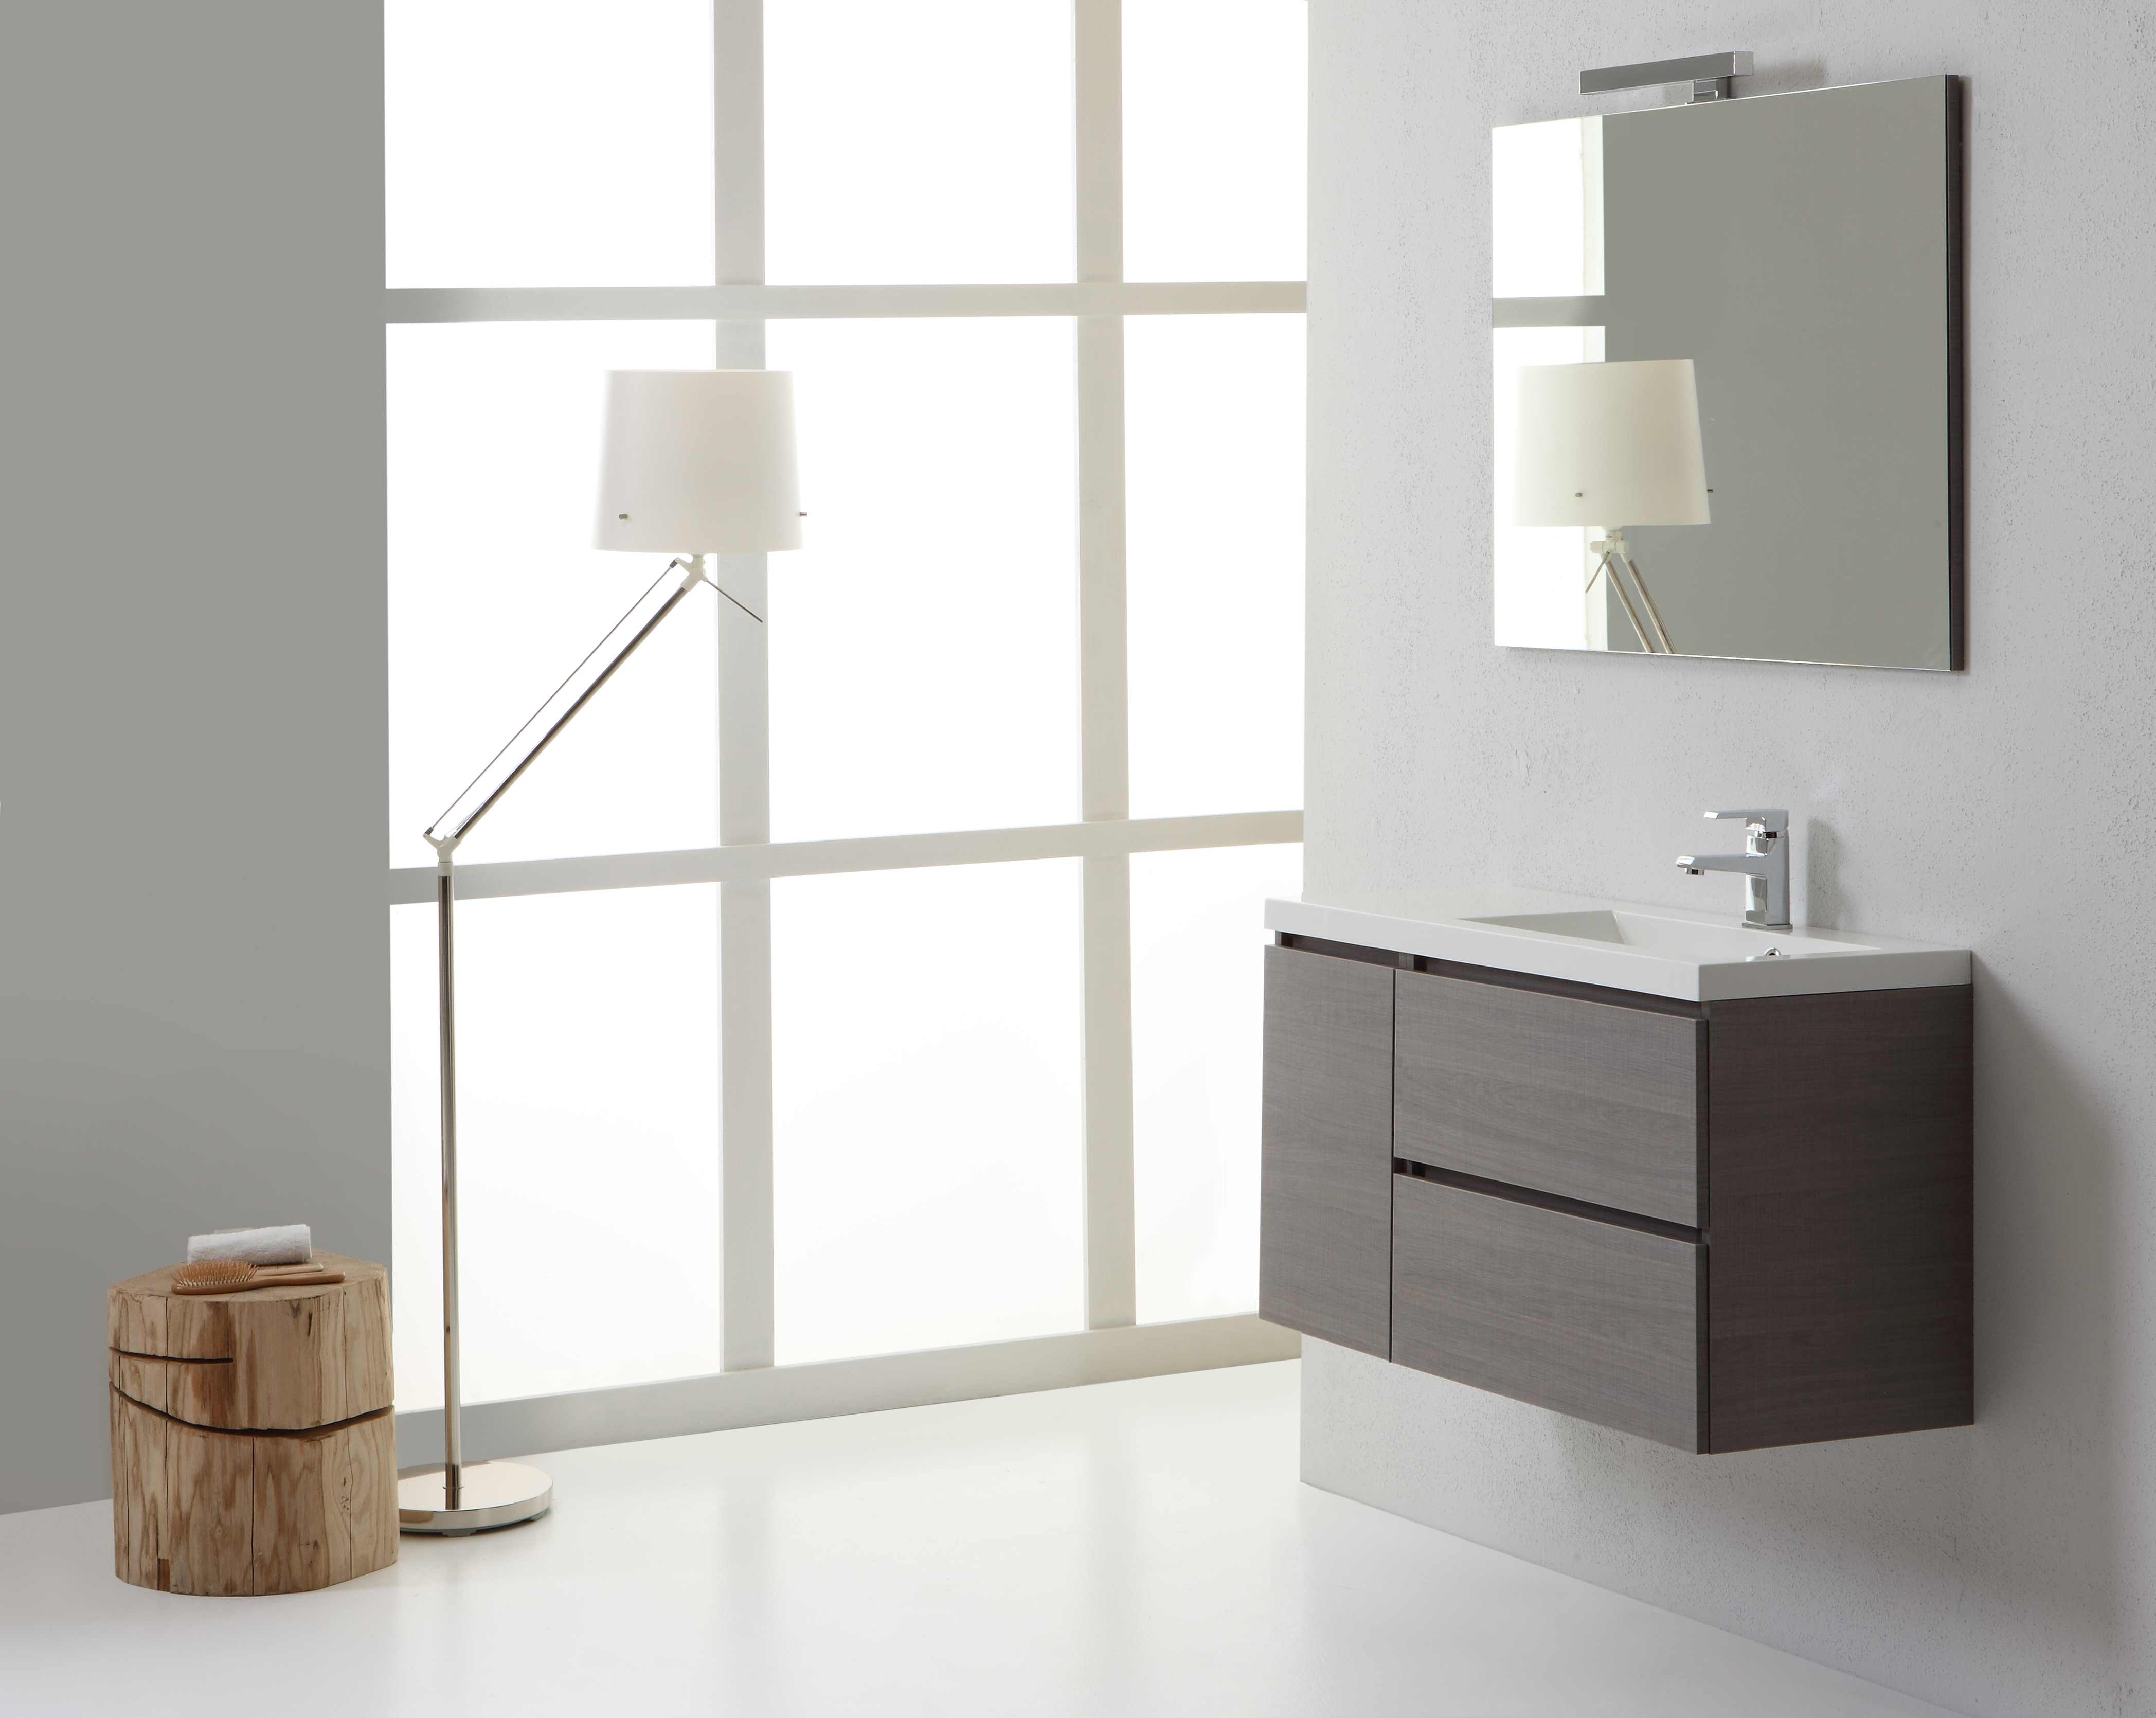 Mobile bagno 90 cm sospeso manhattan lavabo 90 cm destro cassetti grigio modern ebay - Lavabo bagno sospeso offerta ...